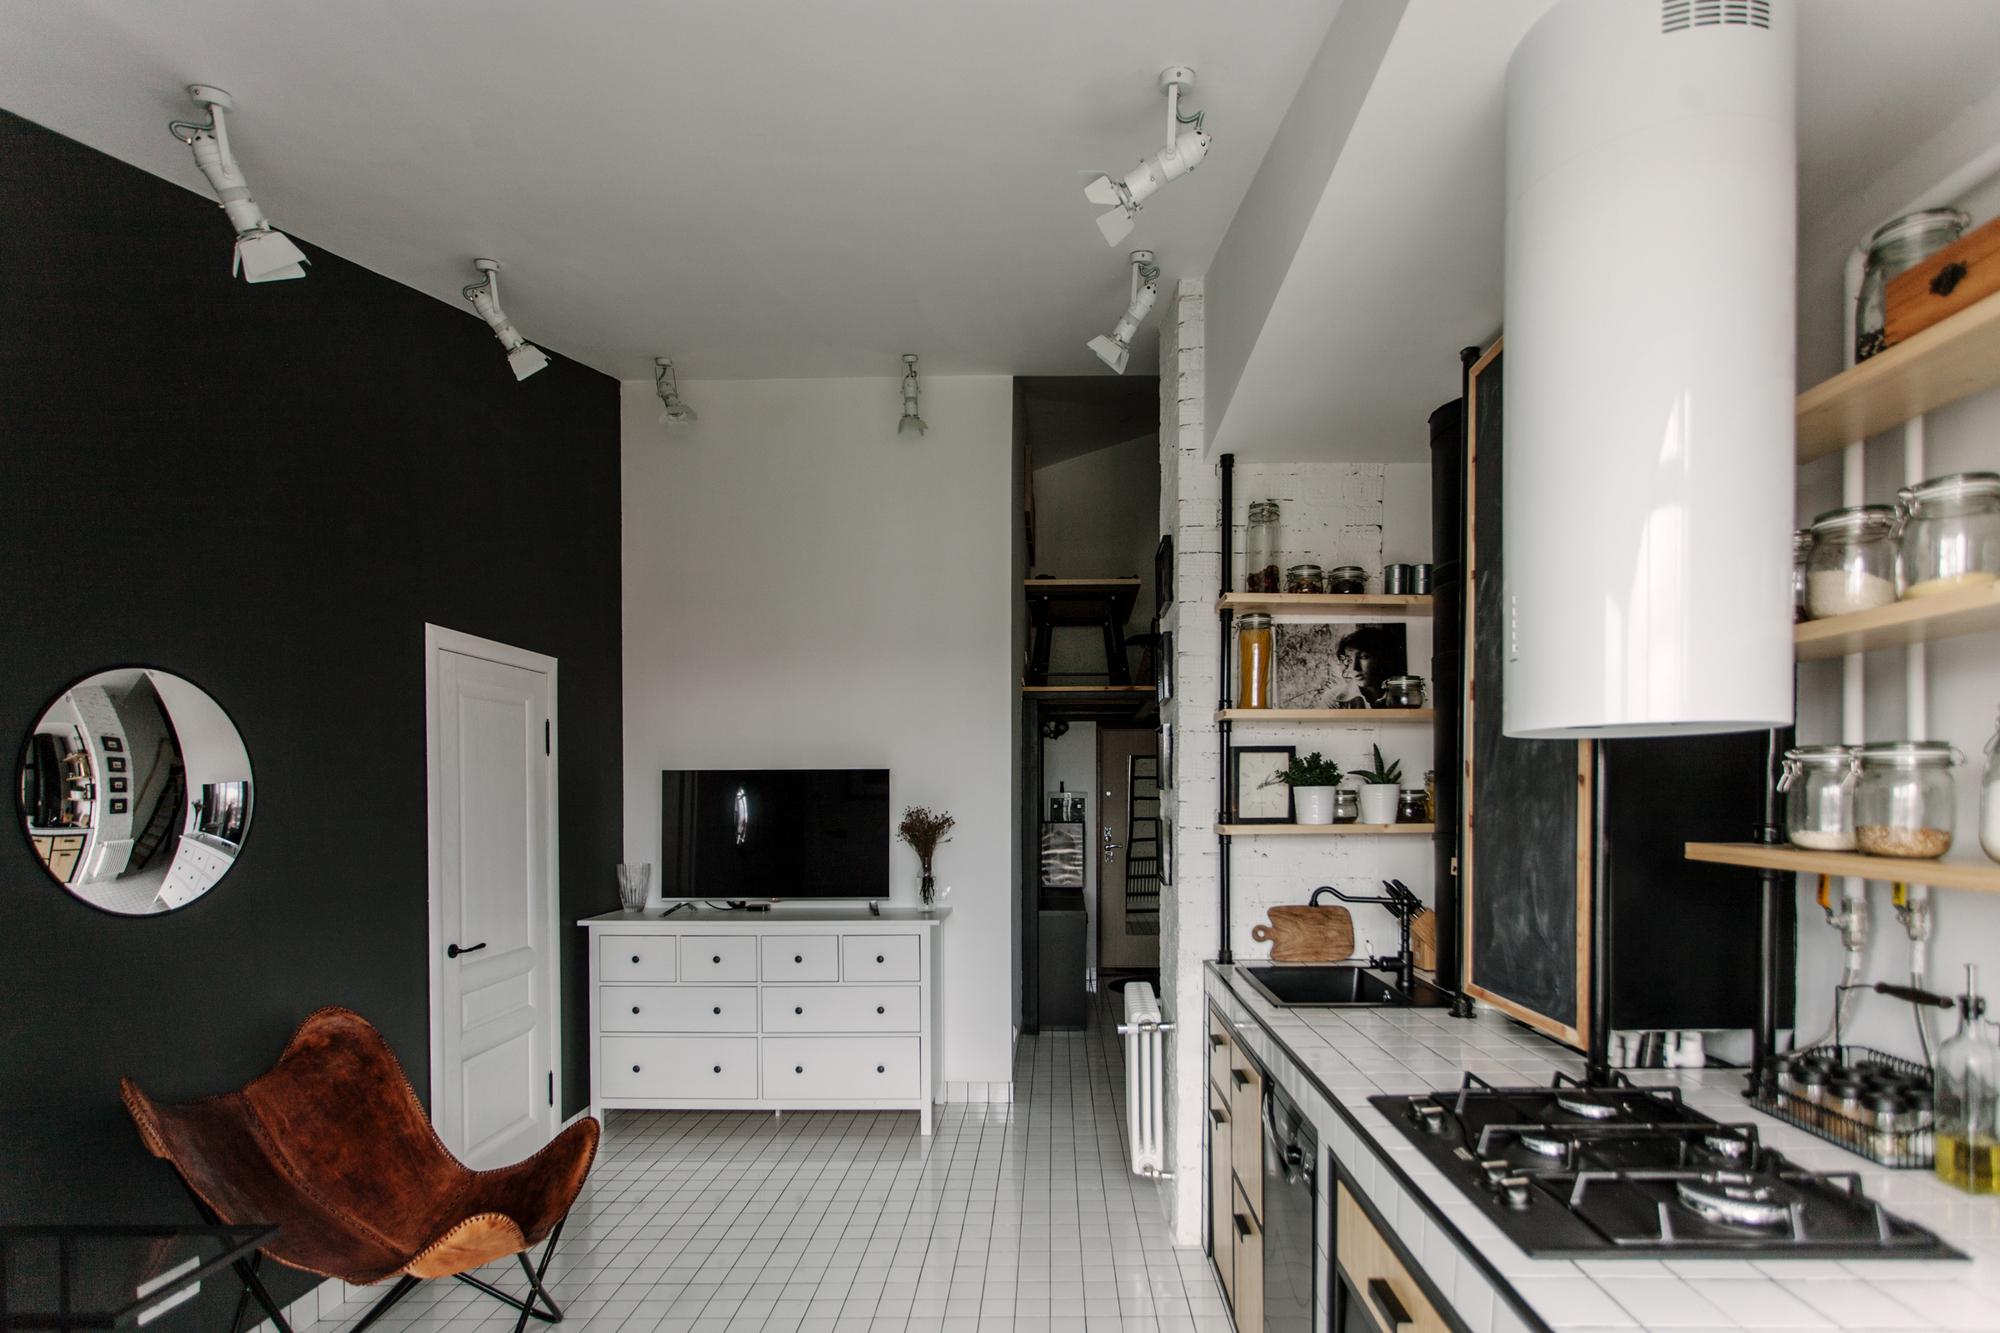 Gallery of attic for an architect buro5 13 for Departamentos decorados en blanco